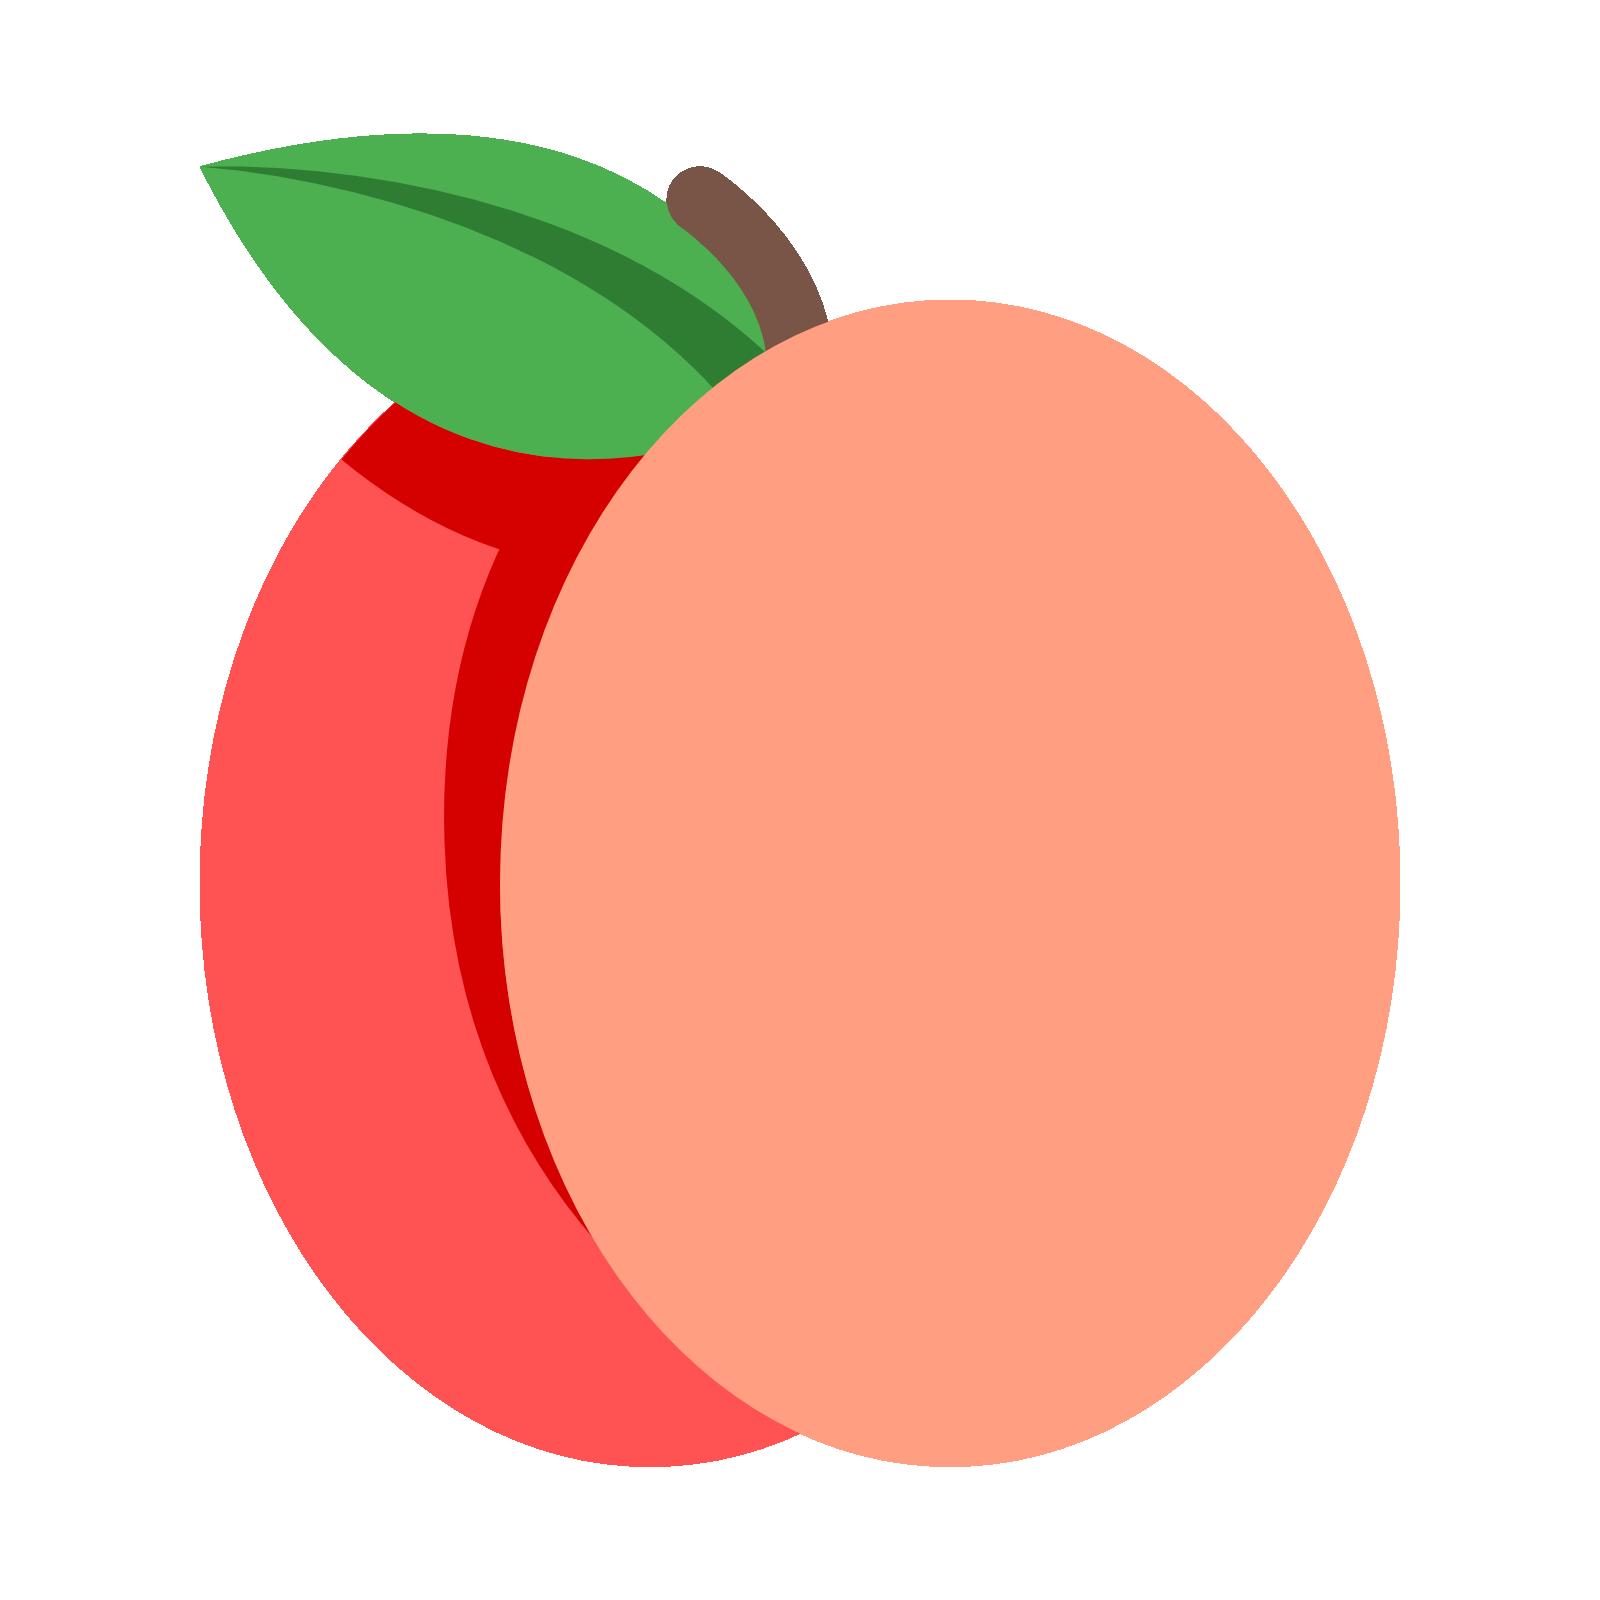 Fruits clipart peach. Computer icons fruit clip